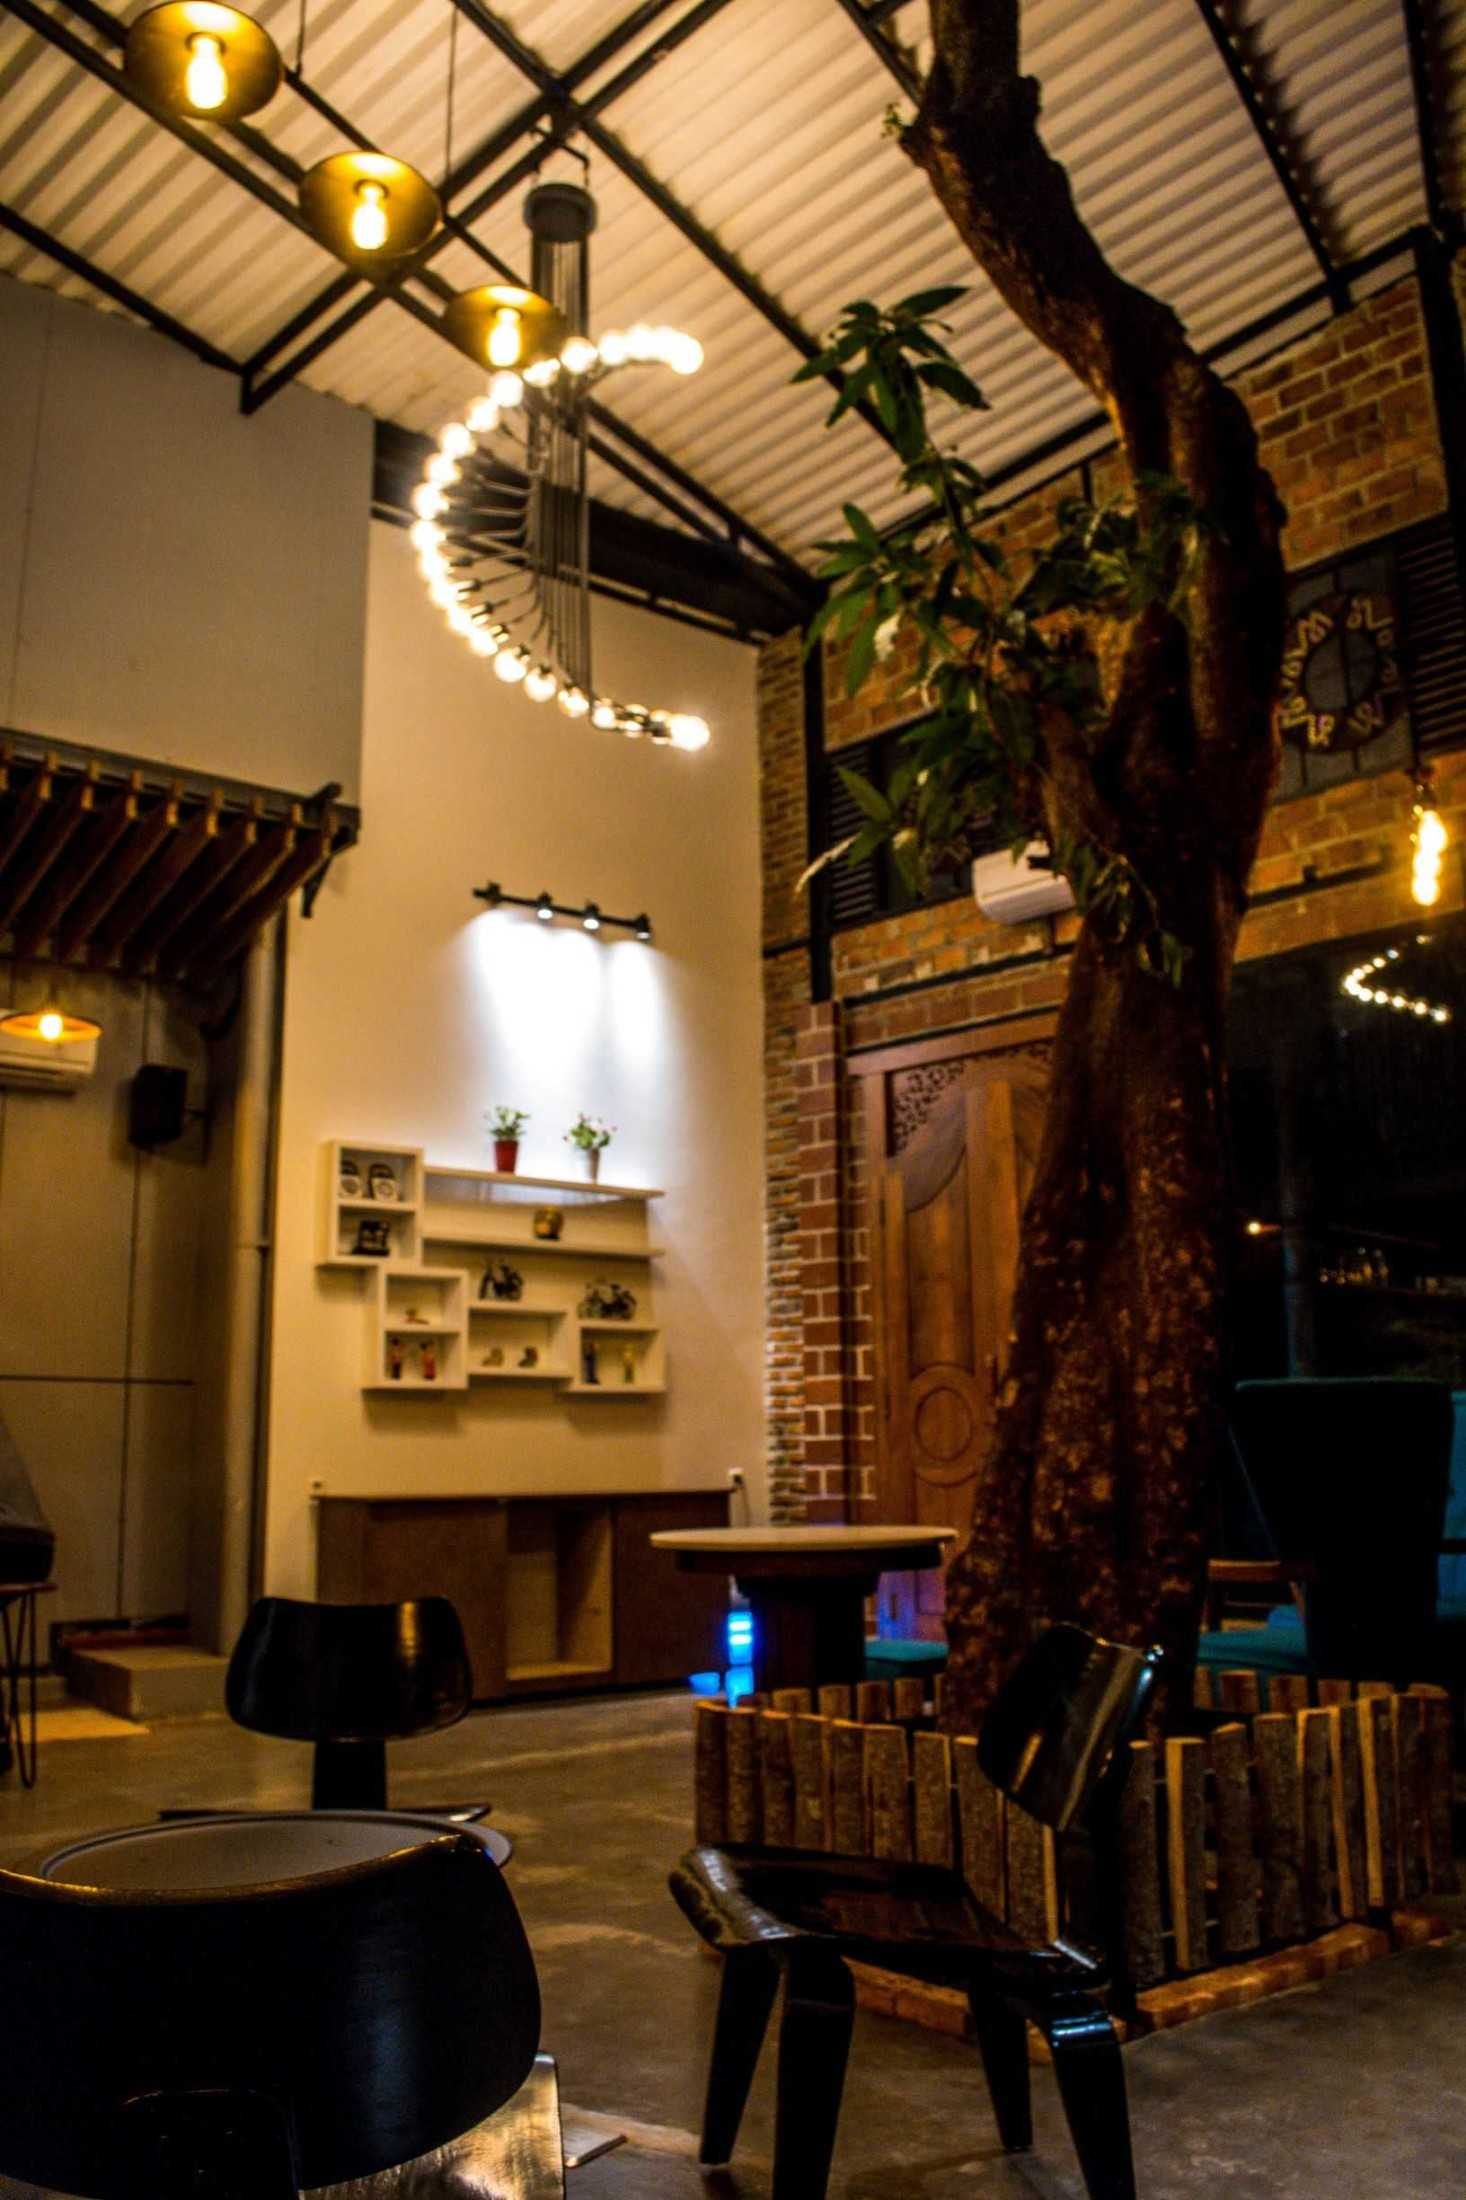 Gohte Architects Terroir Coffee & Eat Jl. Wijaya Timur I No.6, Rt.15/rw.2, Petogogan, Kec. Kby. Baru, Jakarta, Daerah Khusus Ibukota Jakarta 12170, Indonesia Jl. Wijaya Timur I No.6, Rt.15/rw.2, Petogogan, Kec. Kby. Baru, Jakarta, Daerah Khusus Ibukota Jakarta 12170, Indonesia Gohte-Architects-Terroir-Coffee-Eat  96663